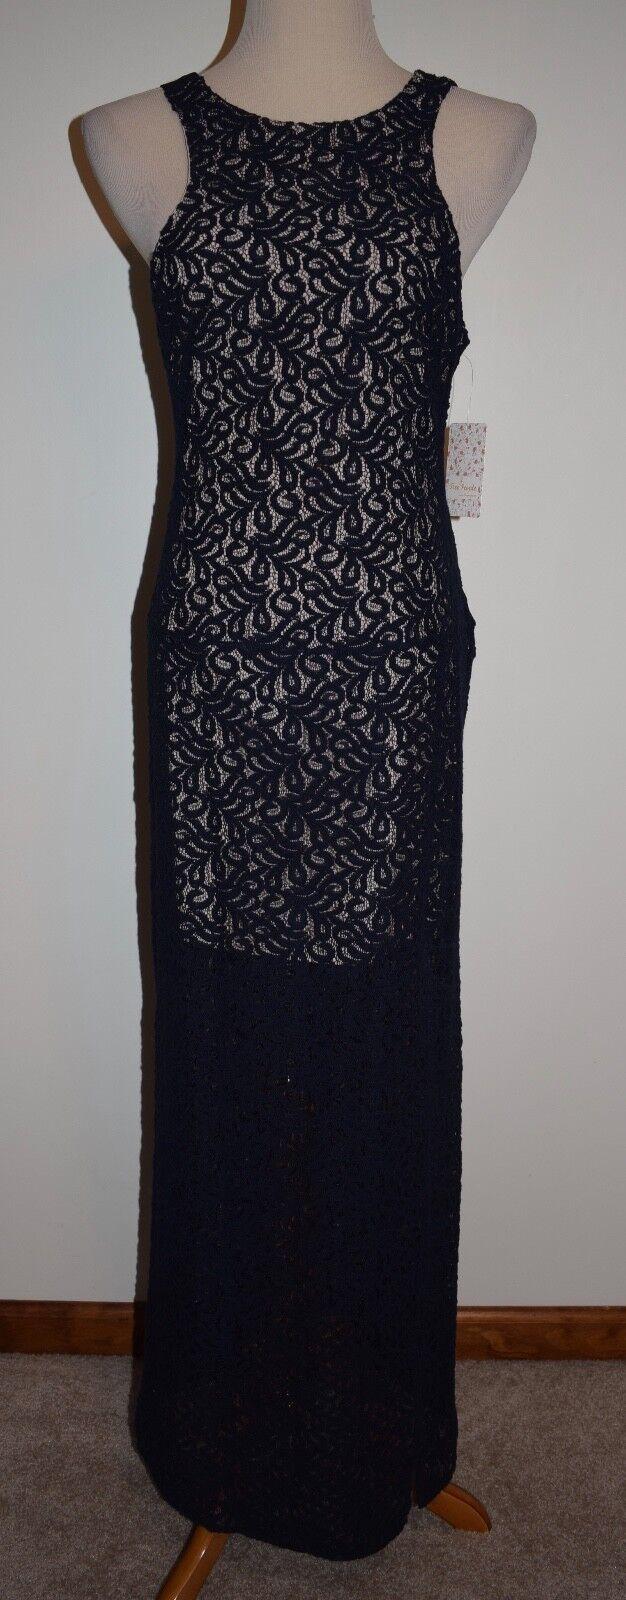 New Free People Sz 6 Long Dress bluee Lace Overlay Sleeveless Maxi Sheath Gown